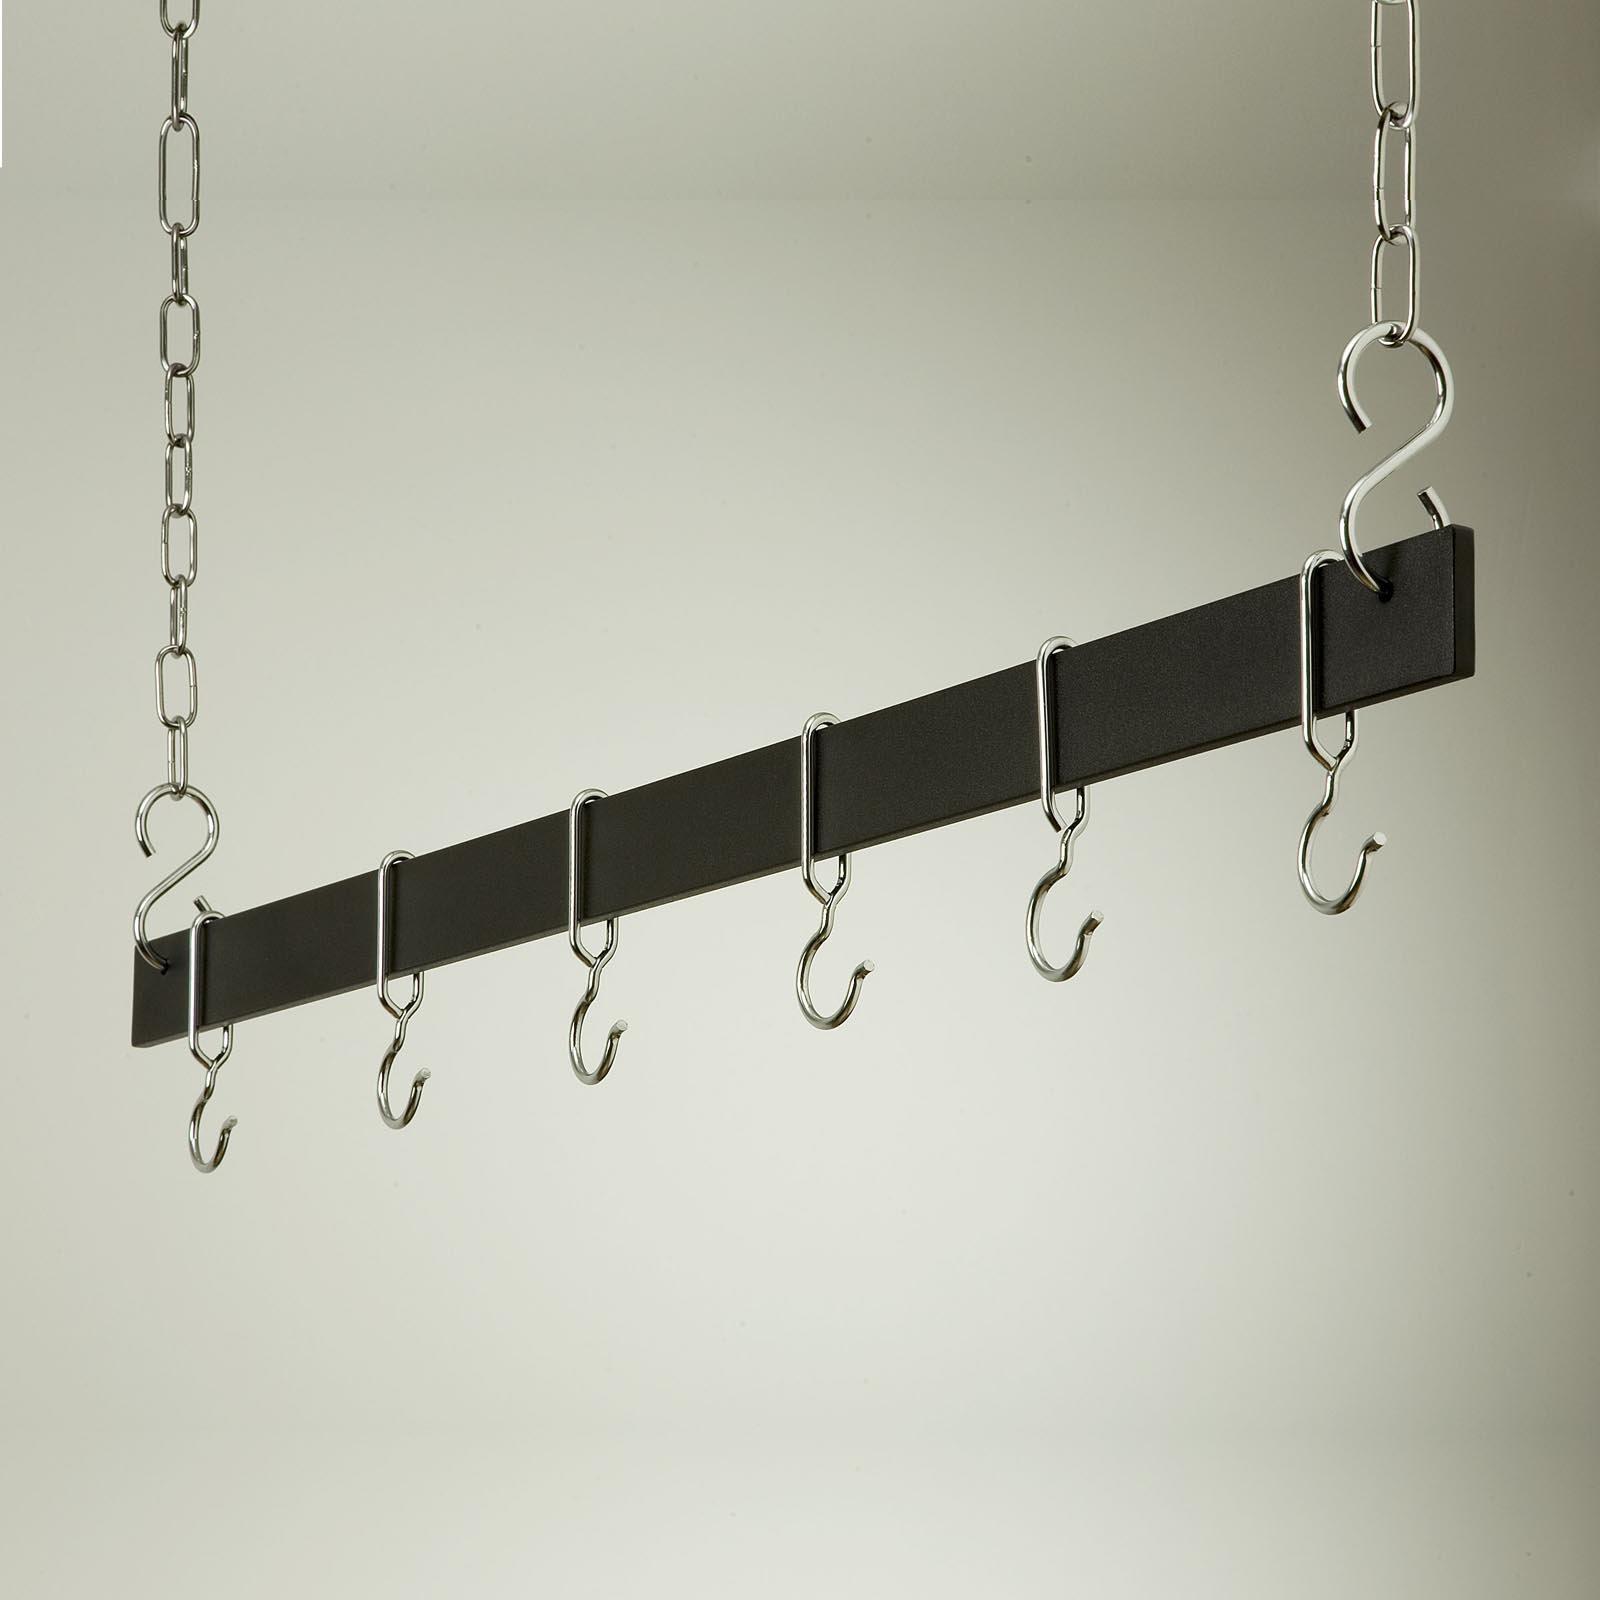 Euro Black and Chrome Hanging Bar Pot Rack